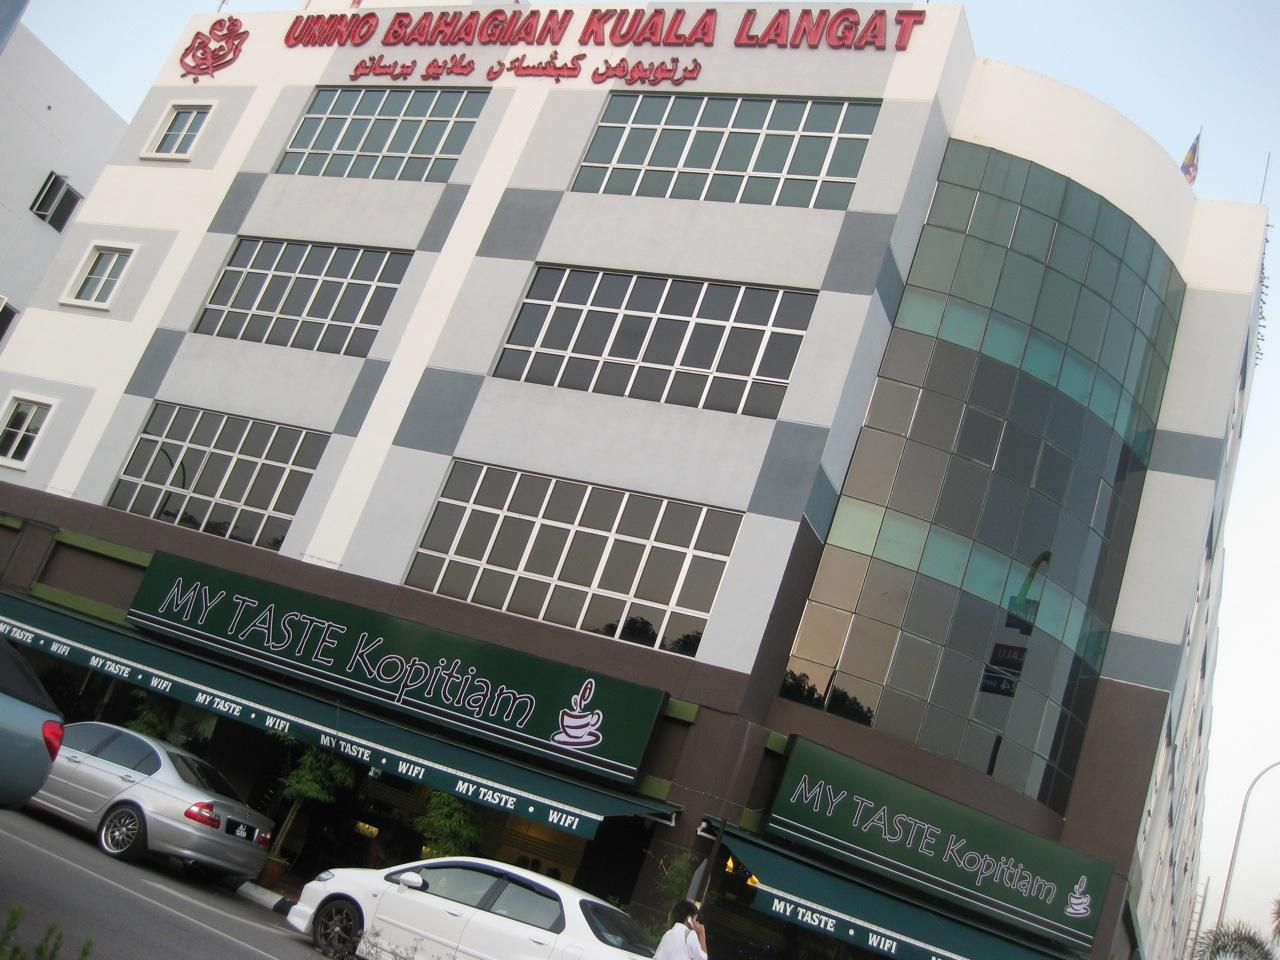 UMNO Kuala Langat